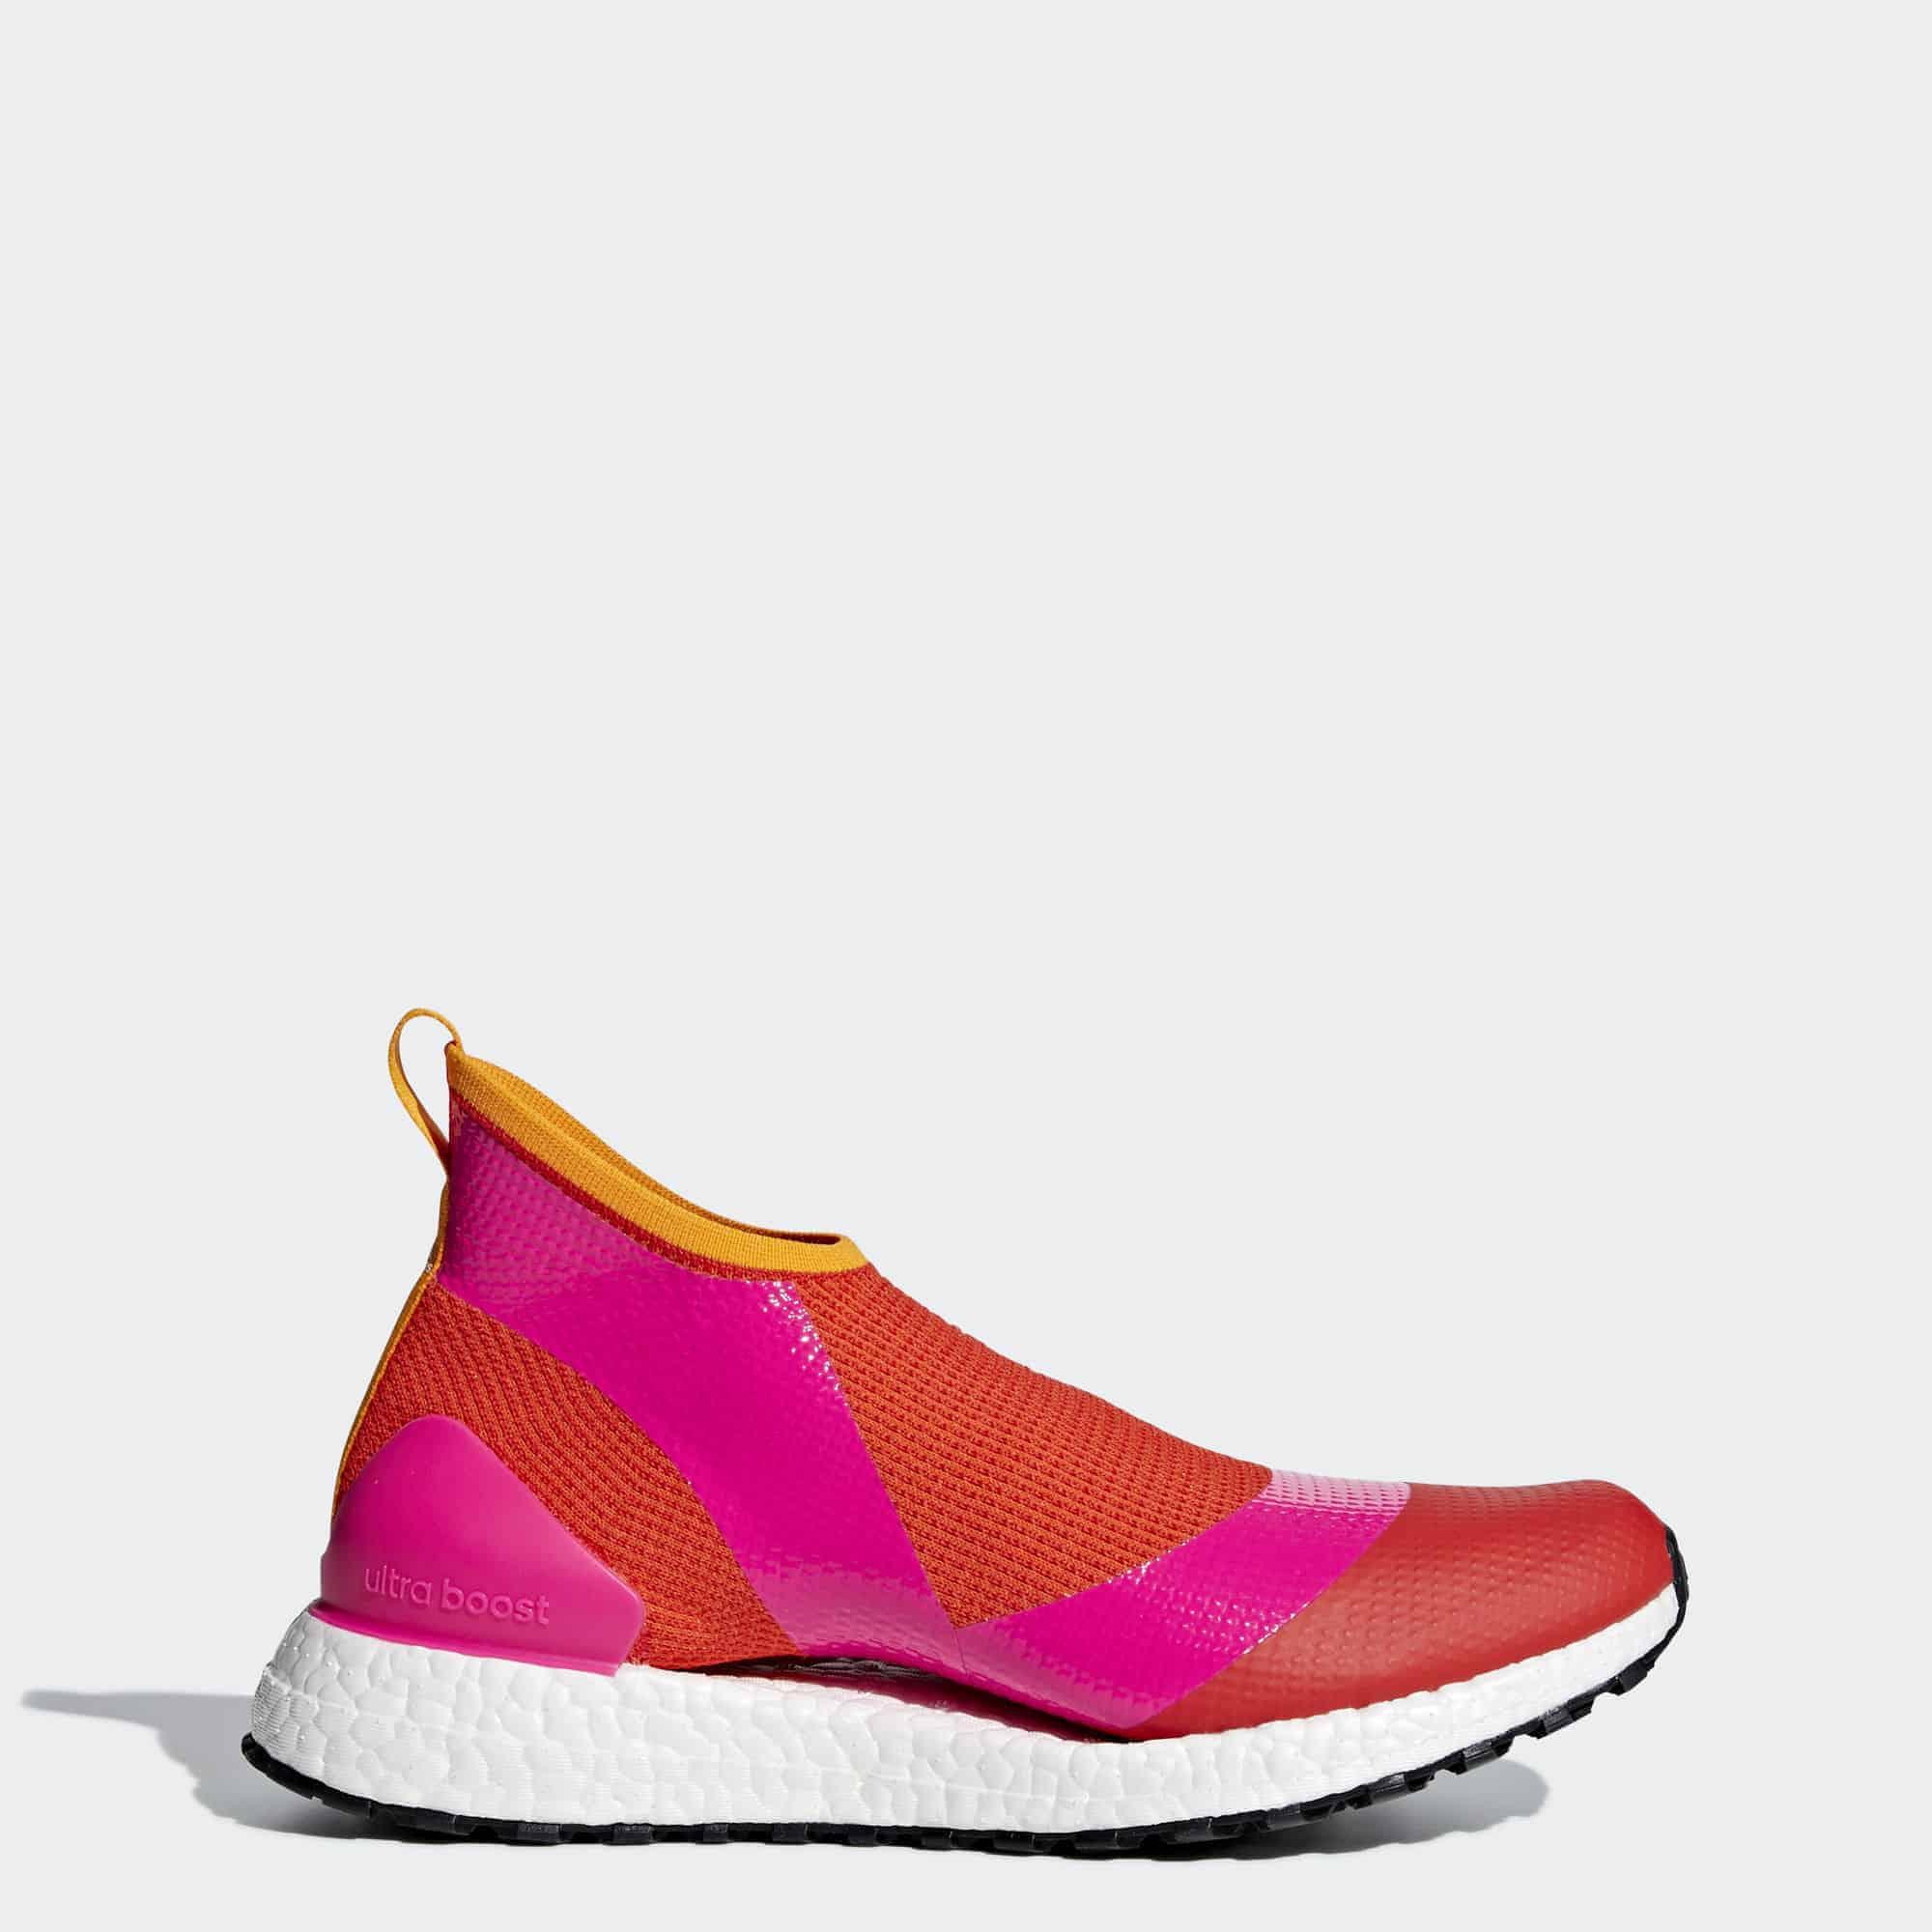 Кроссовки для бега Adidas Ultraboost X All Terrain by Stella McCartney женские